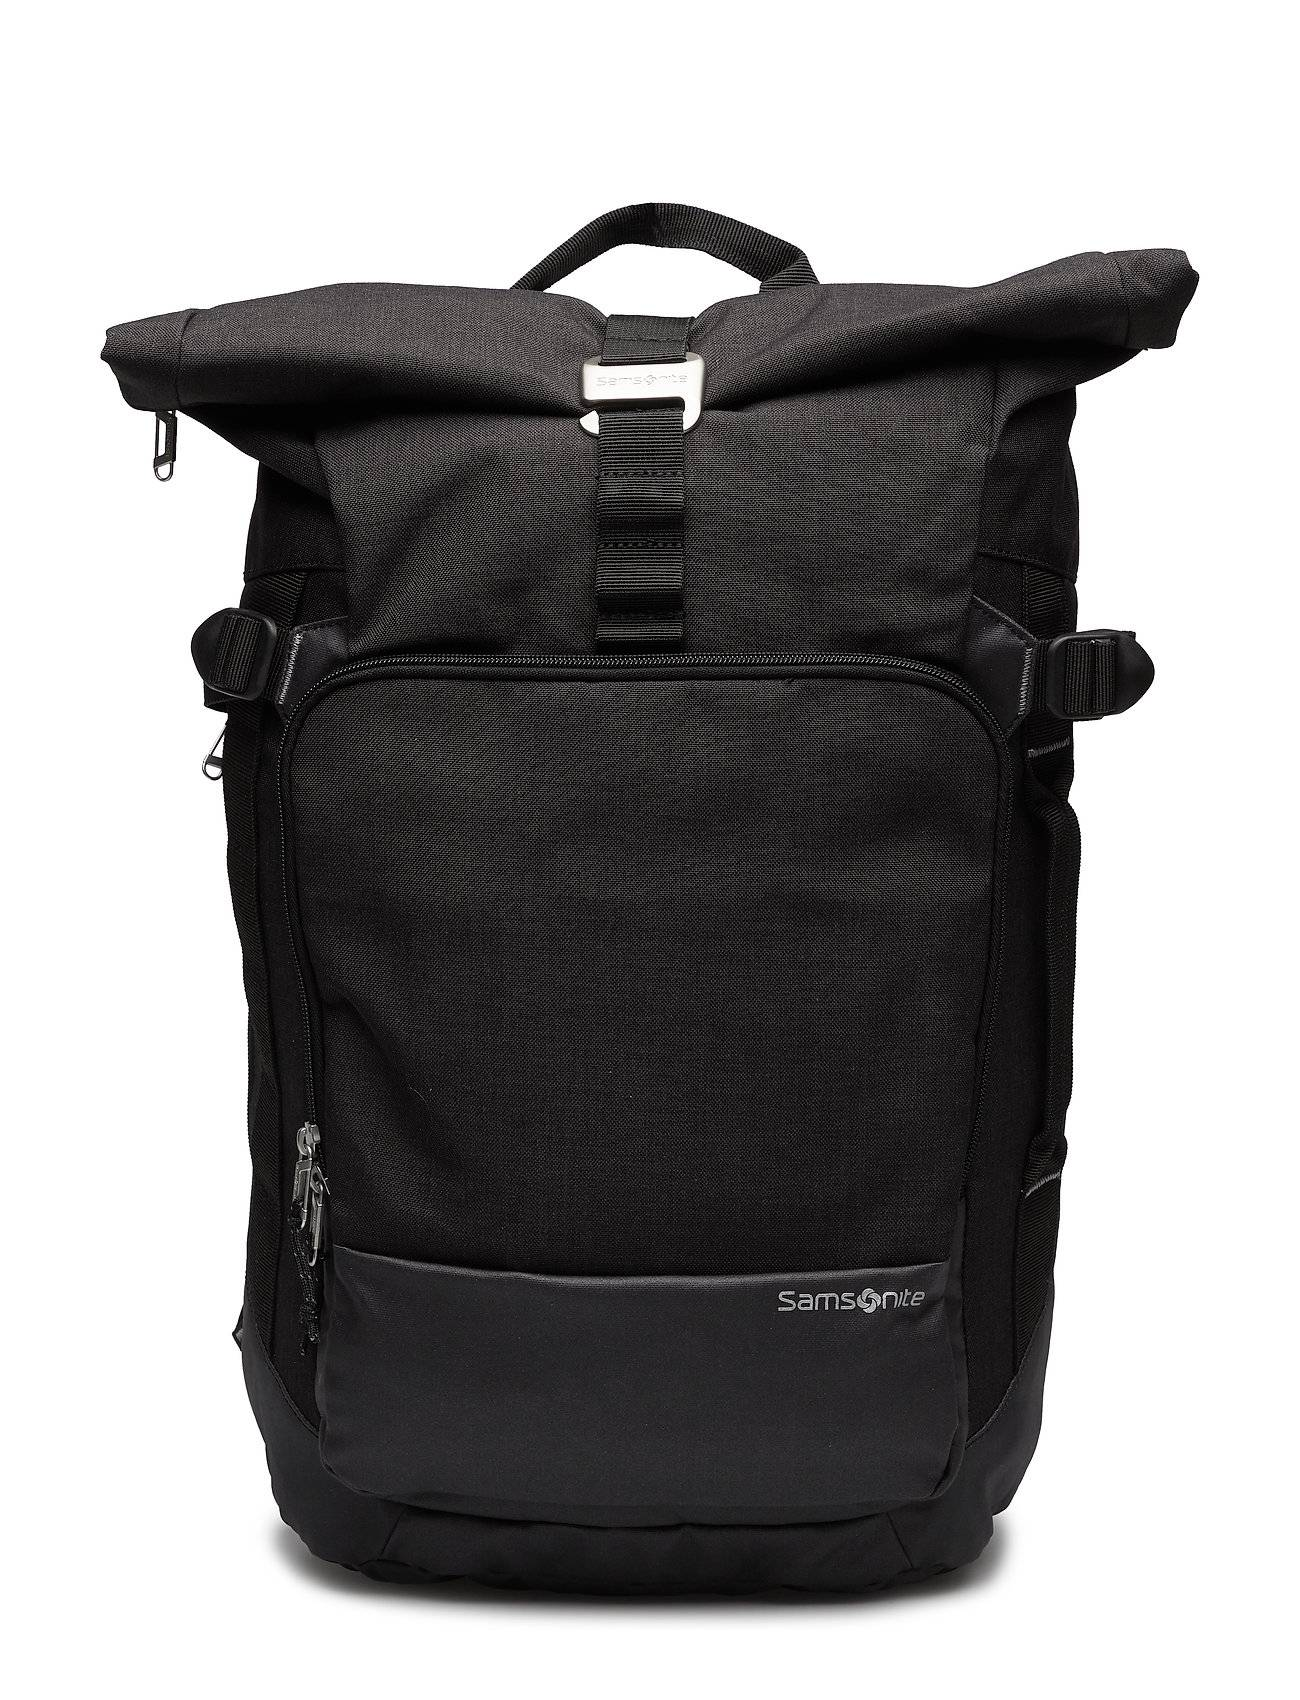 Samsonite Zipproll Backpack M Reppu Laukku Musta